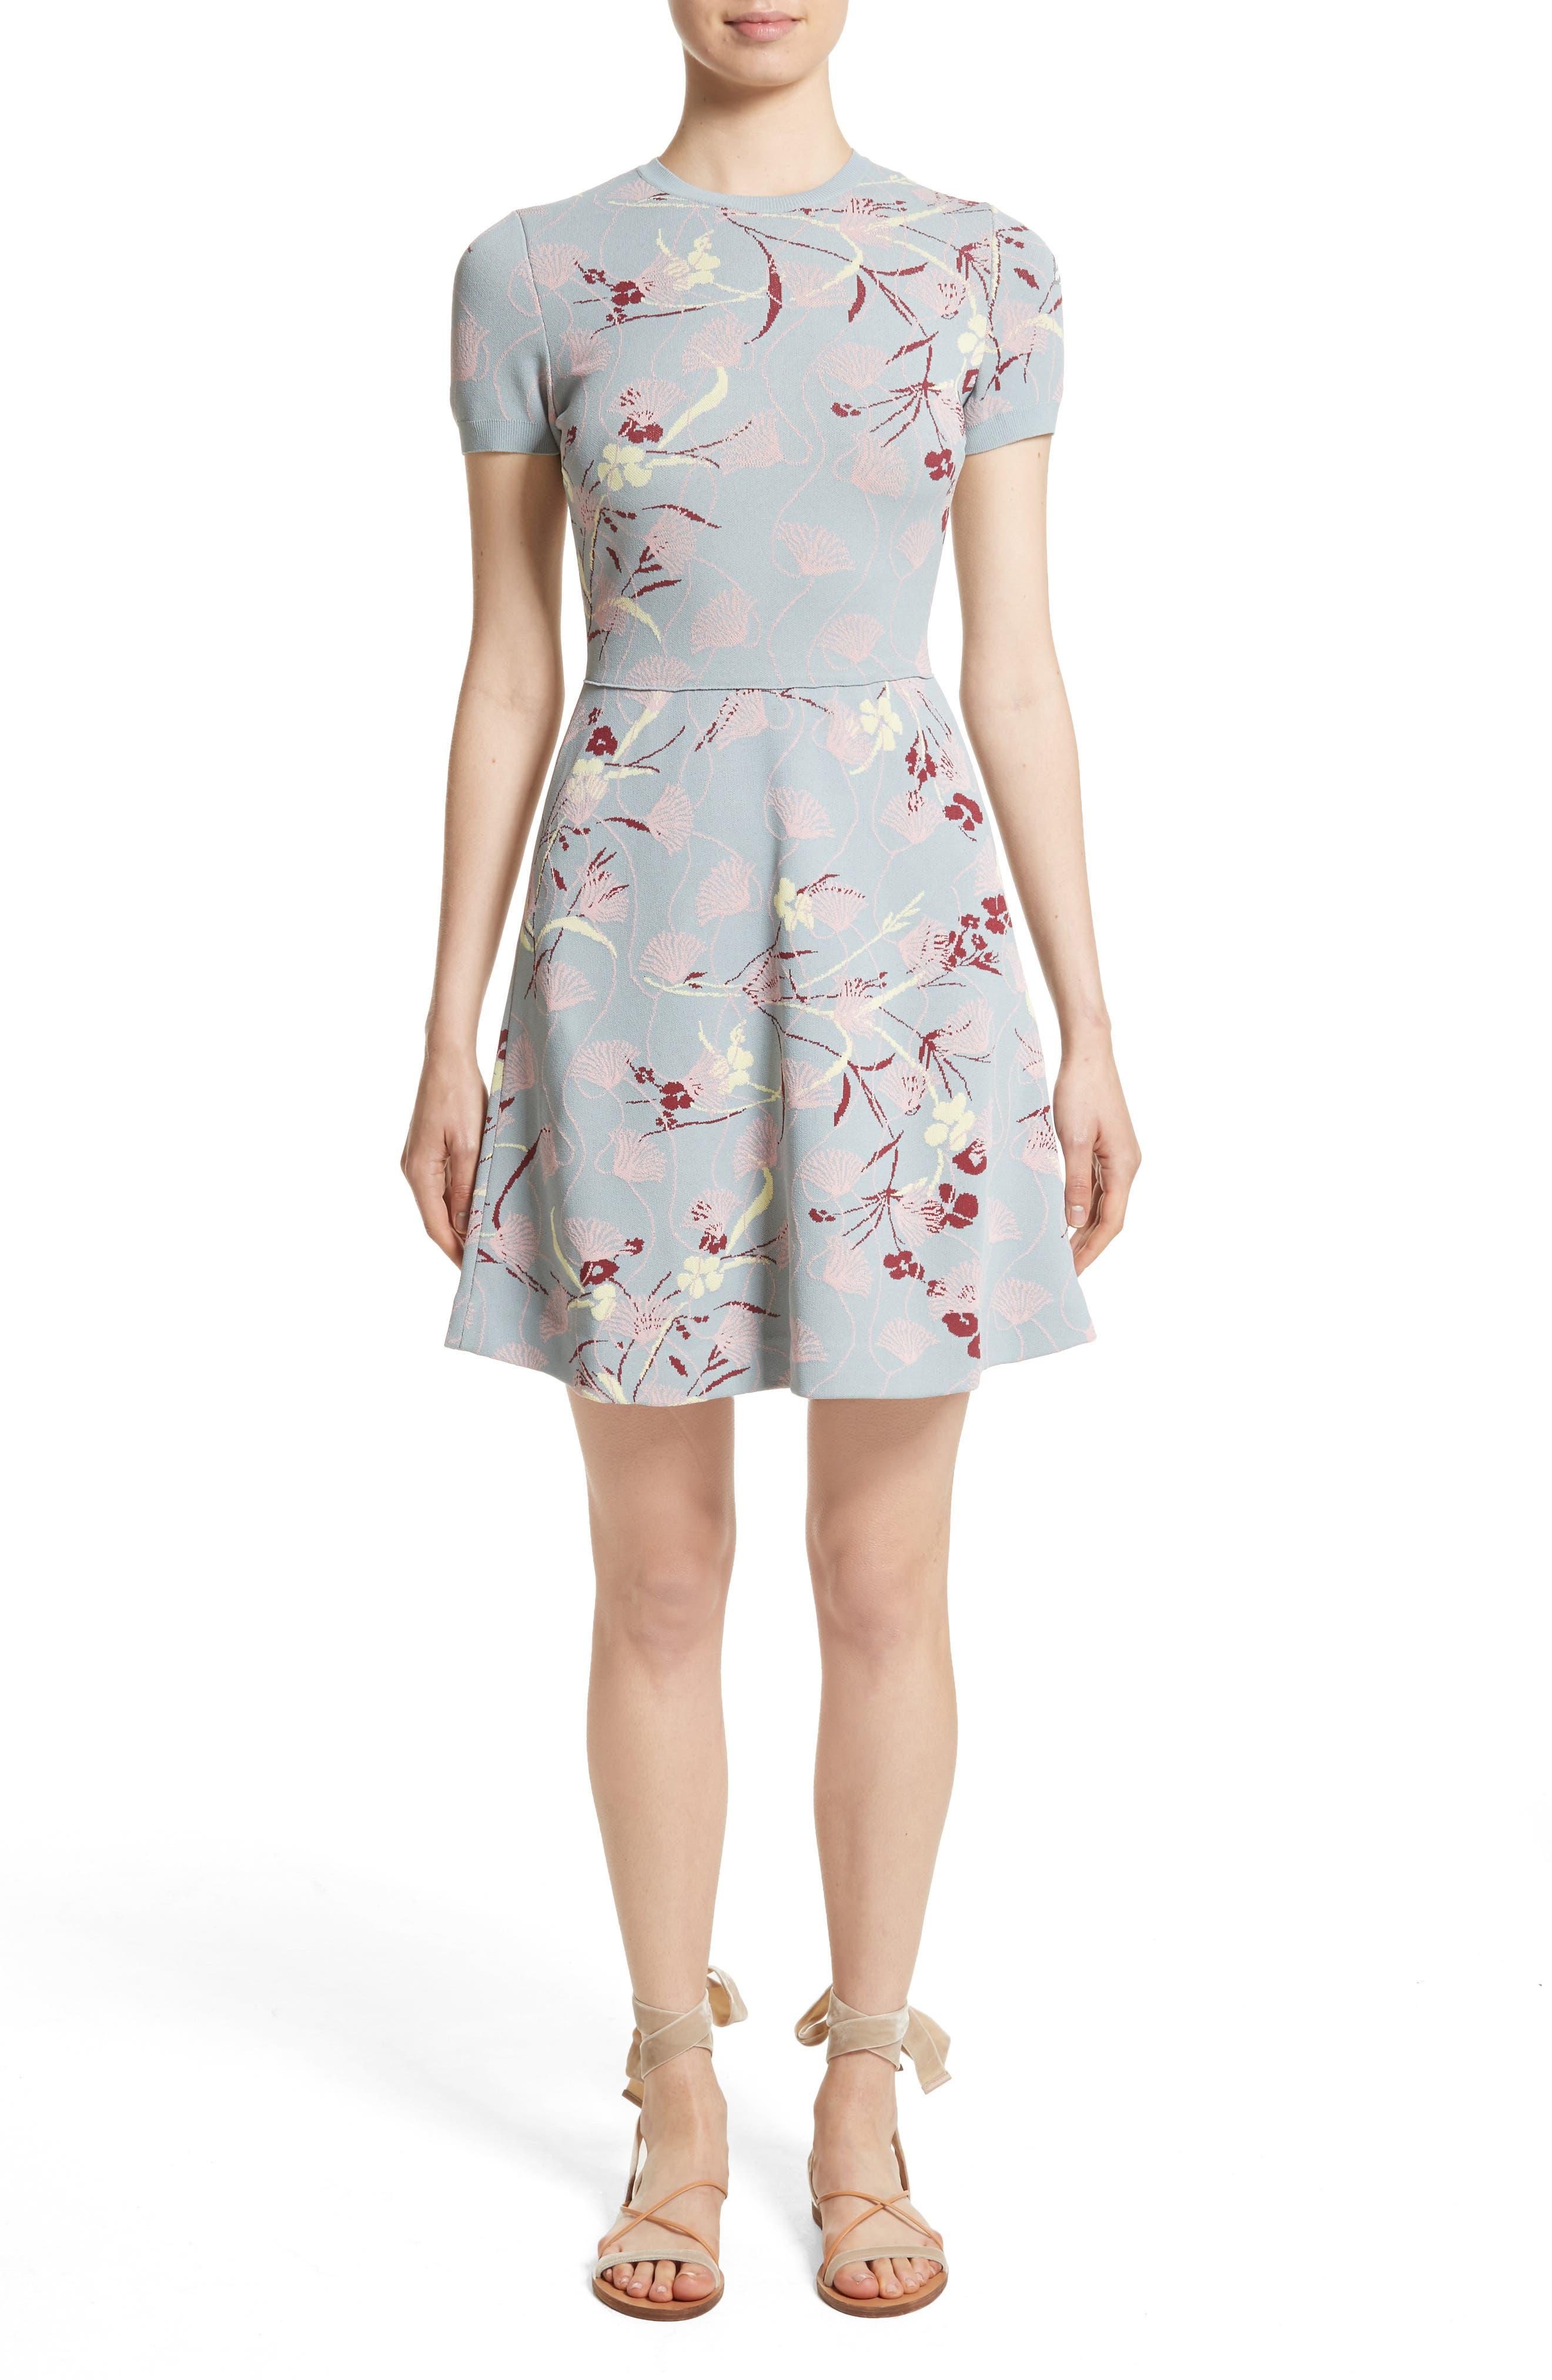 Valentino Floral Jacquard Knit Dress